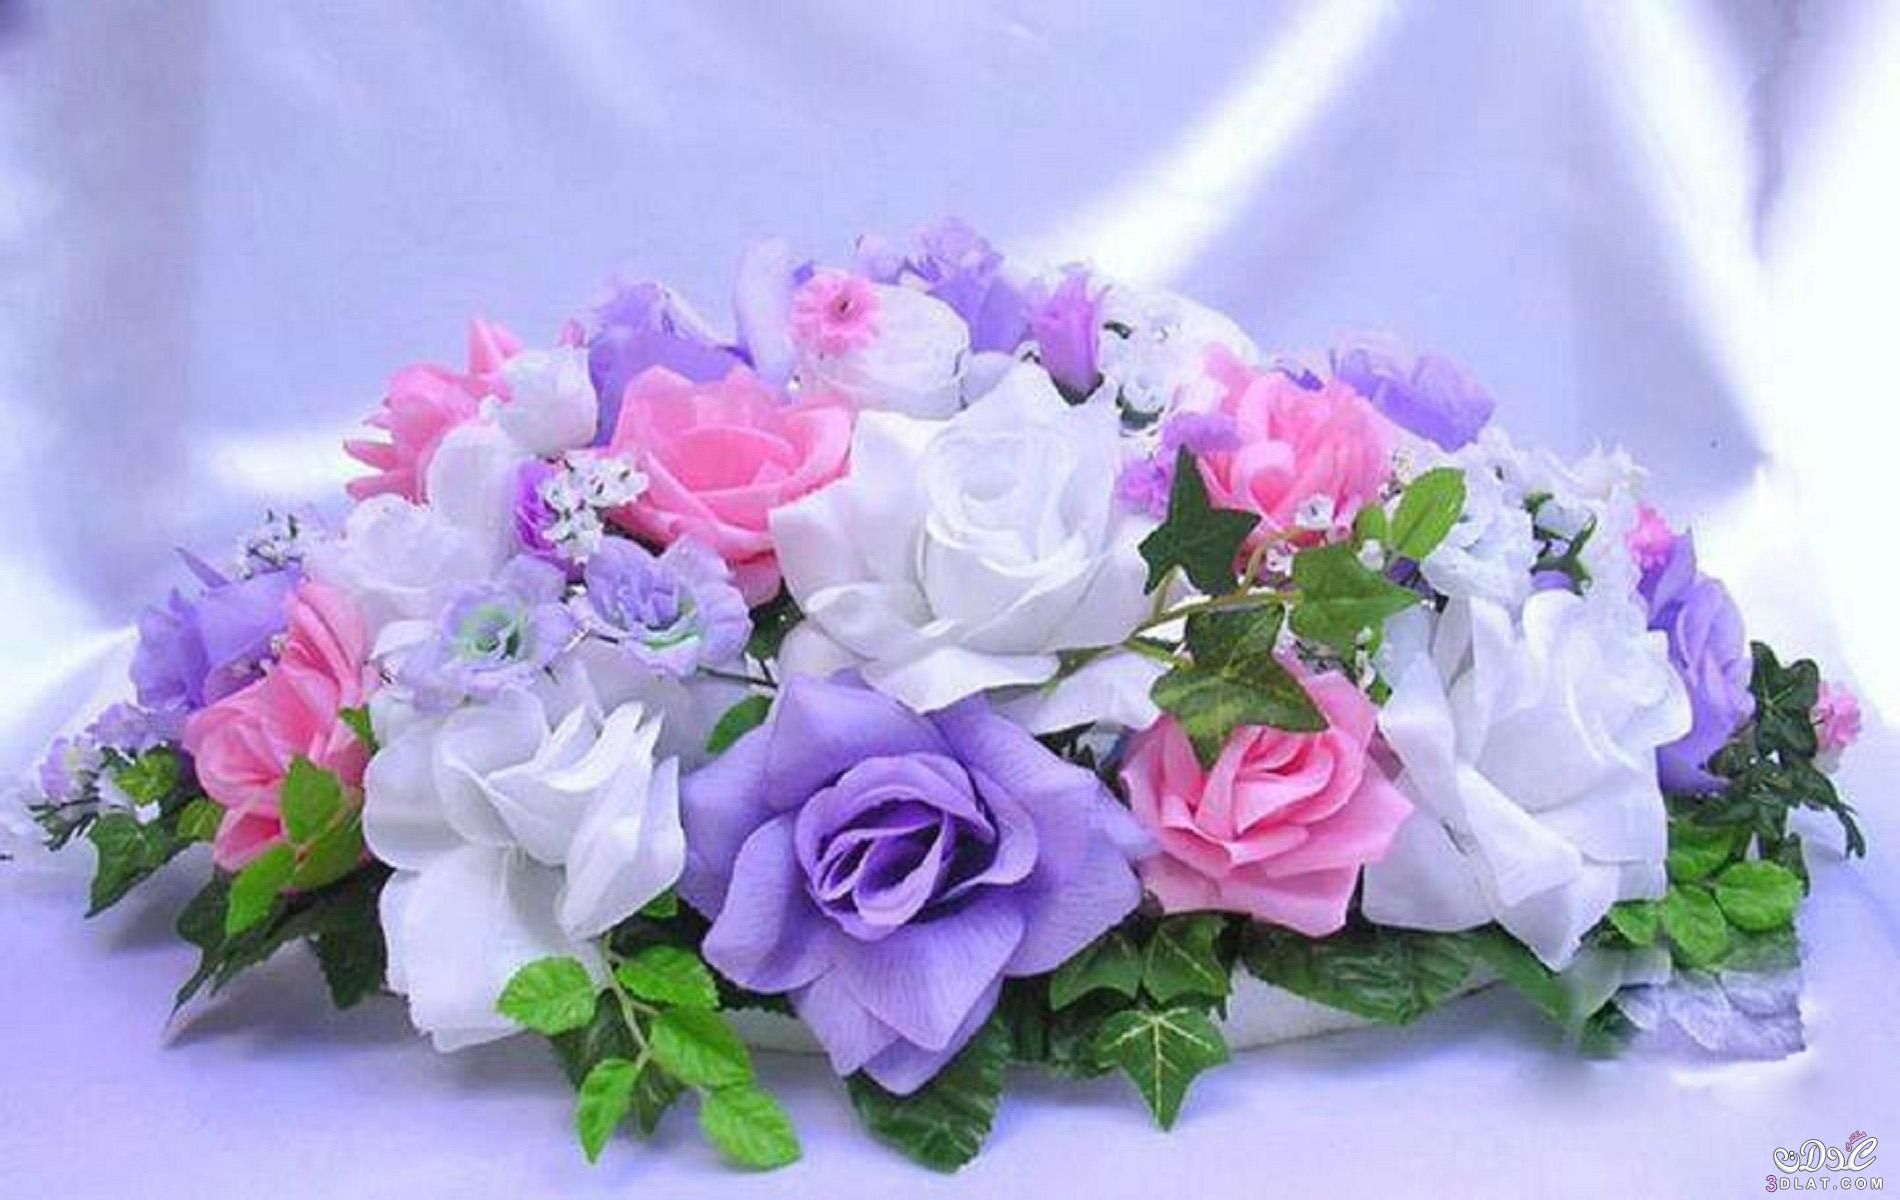 اروع خلفيات ورود 2019 صور ورود رومانسية تحفة 2019 صور زهور مميزة 2019 Birthday Flowers Bouquet Flower Bouquet Delivery Online Flower Delivery